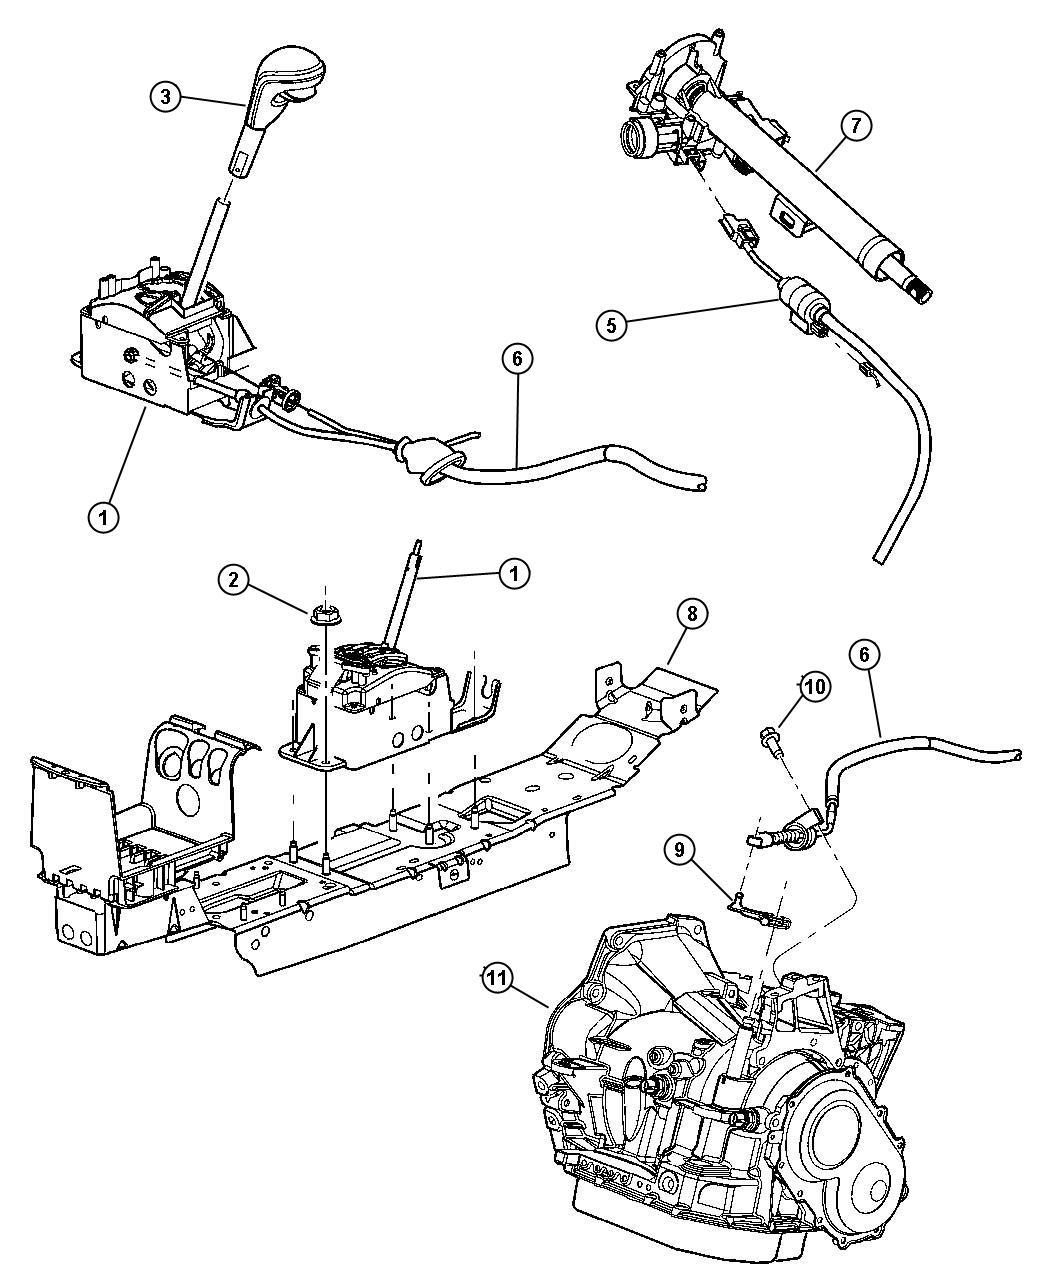 2011 Dodge Avenger Cable  Ignition Interlock  Controls